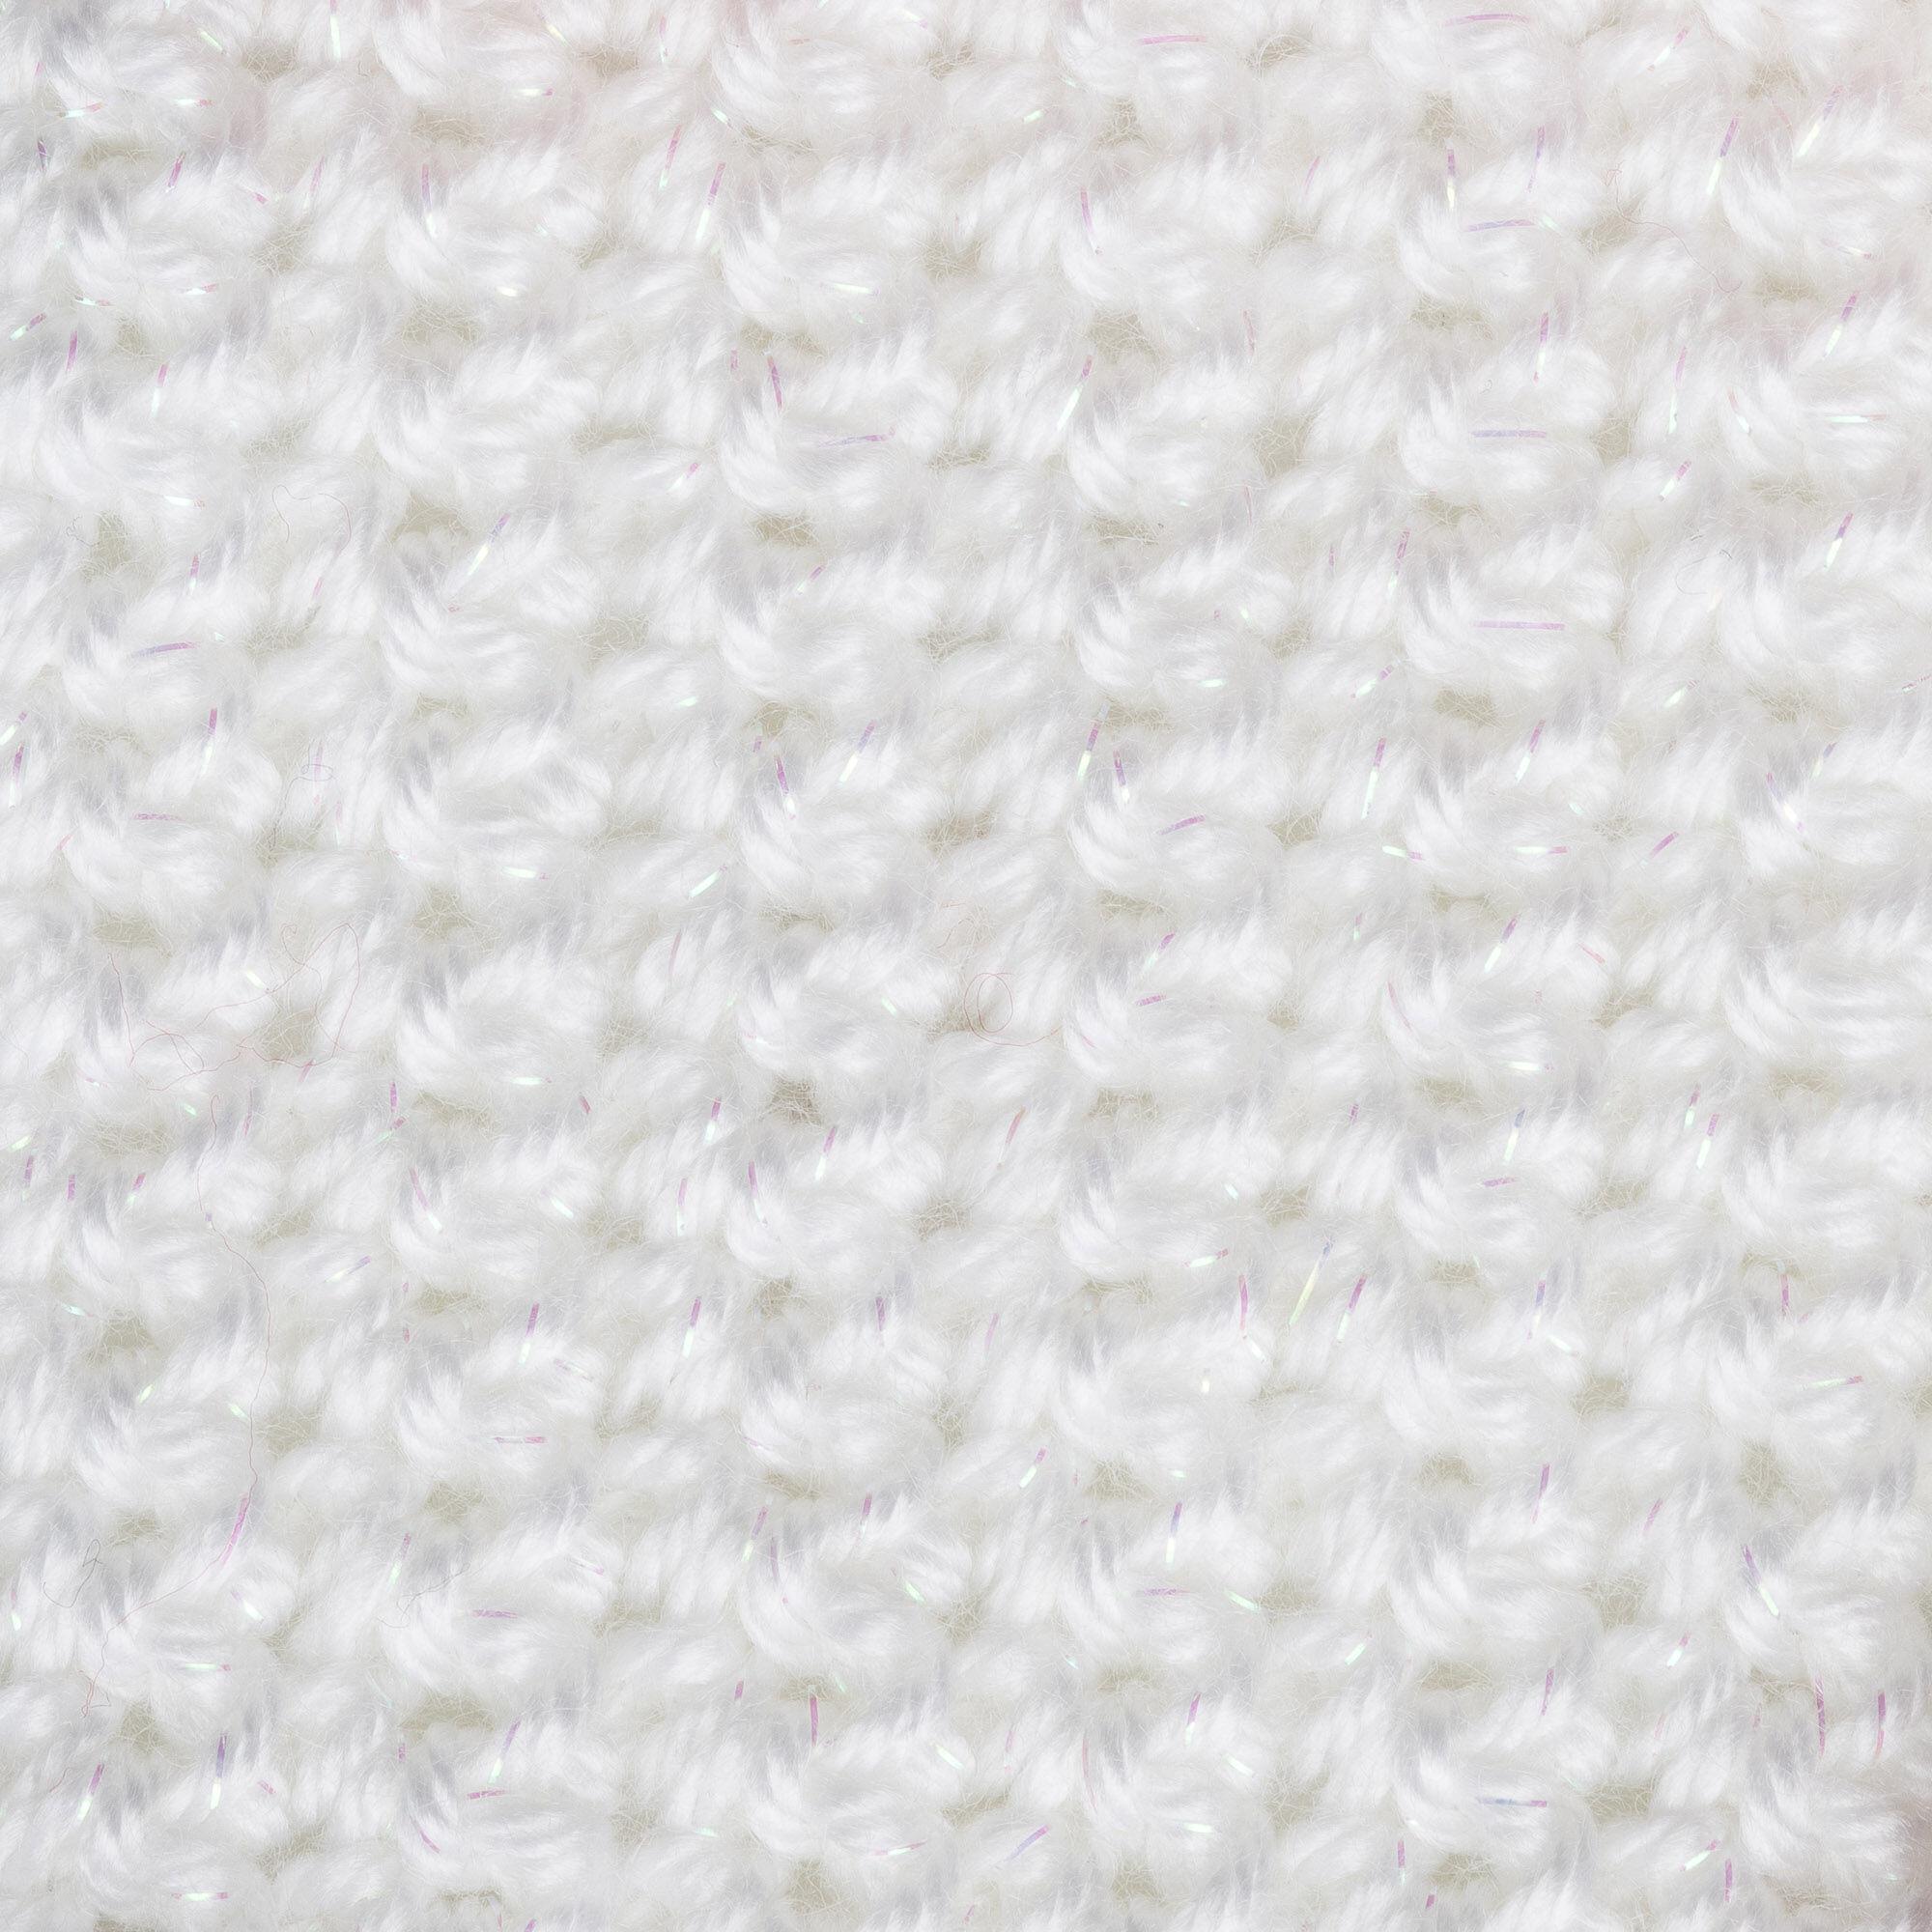 Caron Simply Soft Party Yarn Snow Sparkle Yarnspirations